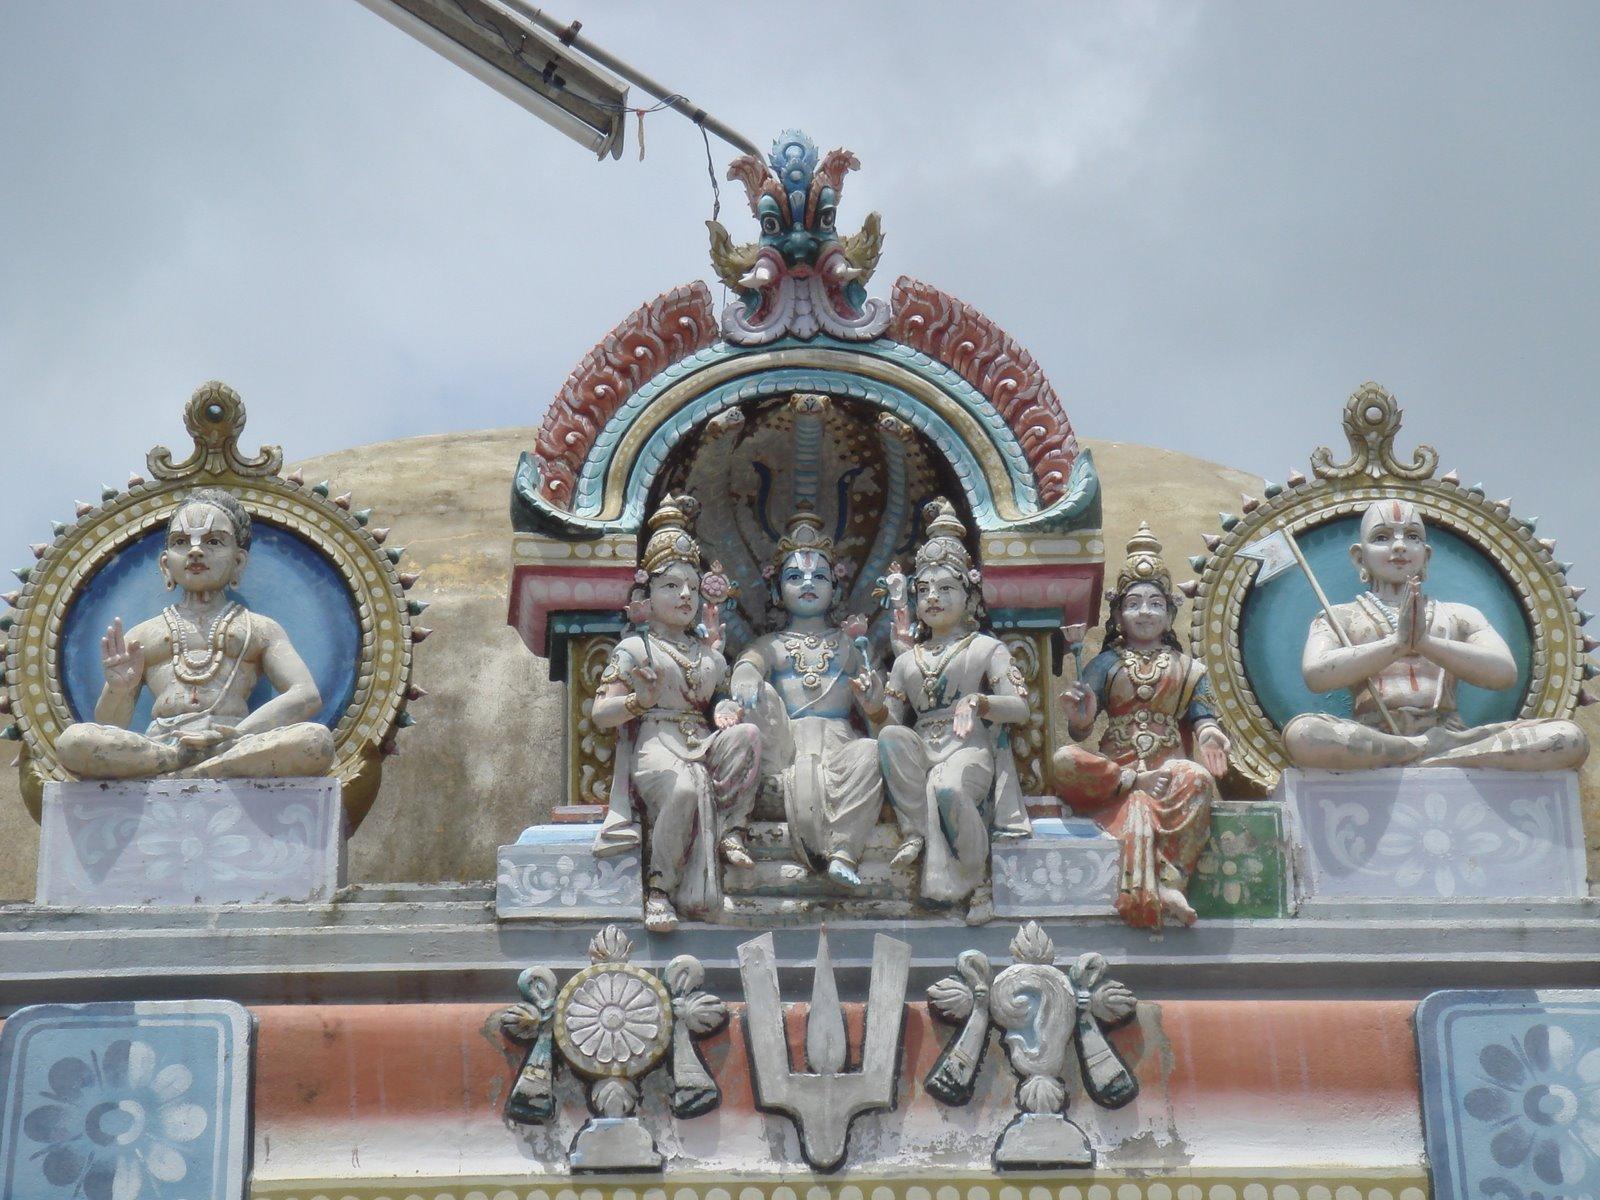 Sri Vaikunta Nathan Perumal Temple (Vaidunta Vinnagaram) Seerkazhi - Divya Desam 35